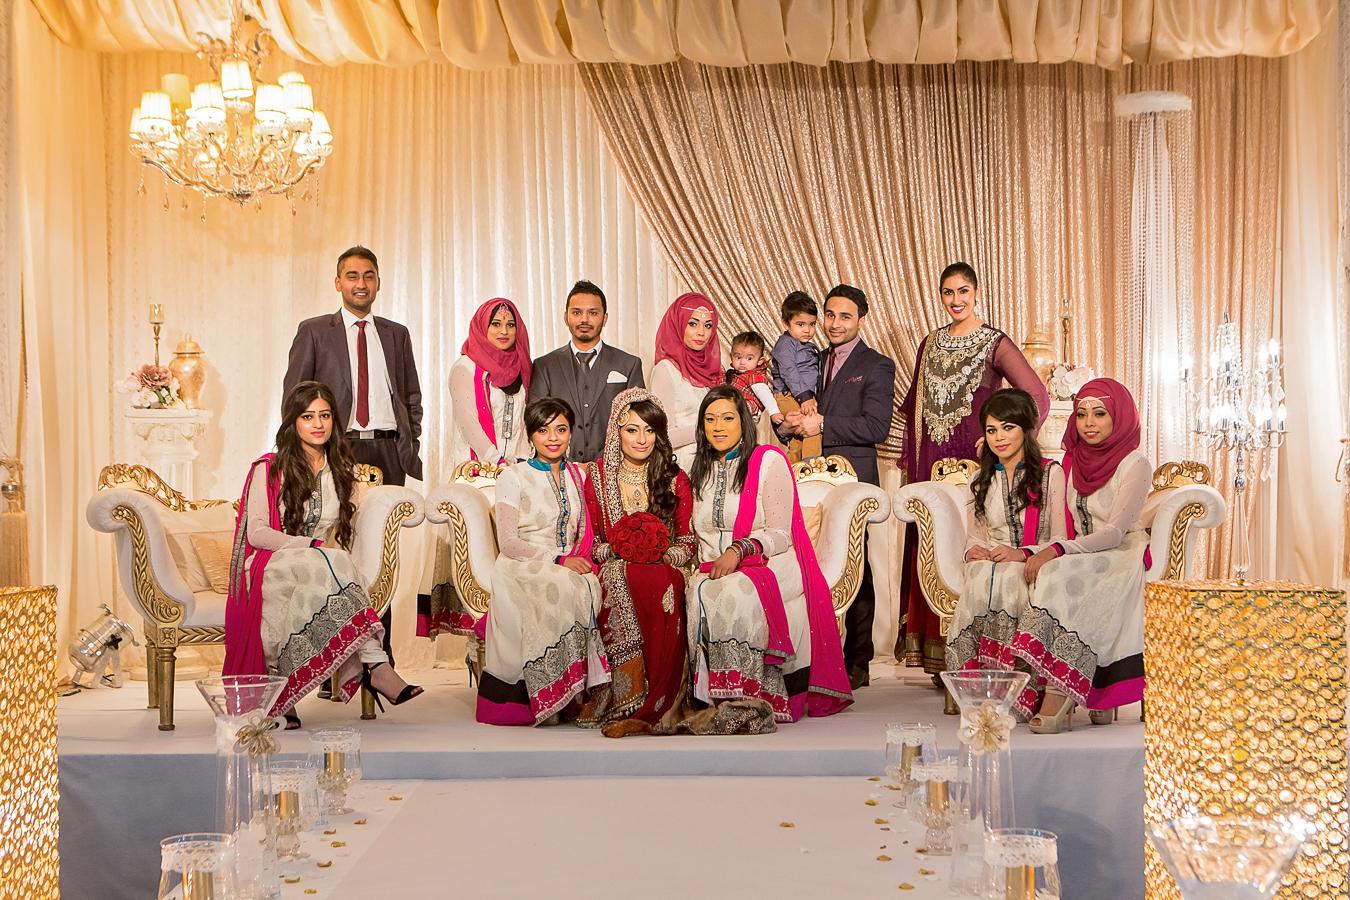 Nasir and Minara wedding at The Sheridan suite Macnchester Didsbury Opu Sultan Photography Manchester and Edinburgh Asian Muslim Hindu Sikh-47.jpg